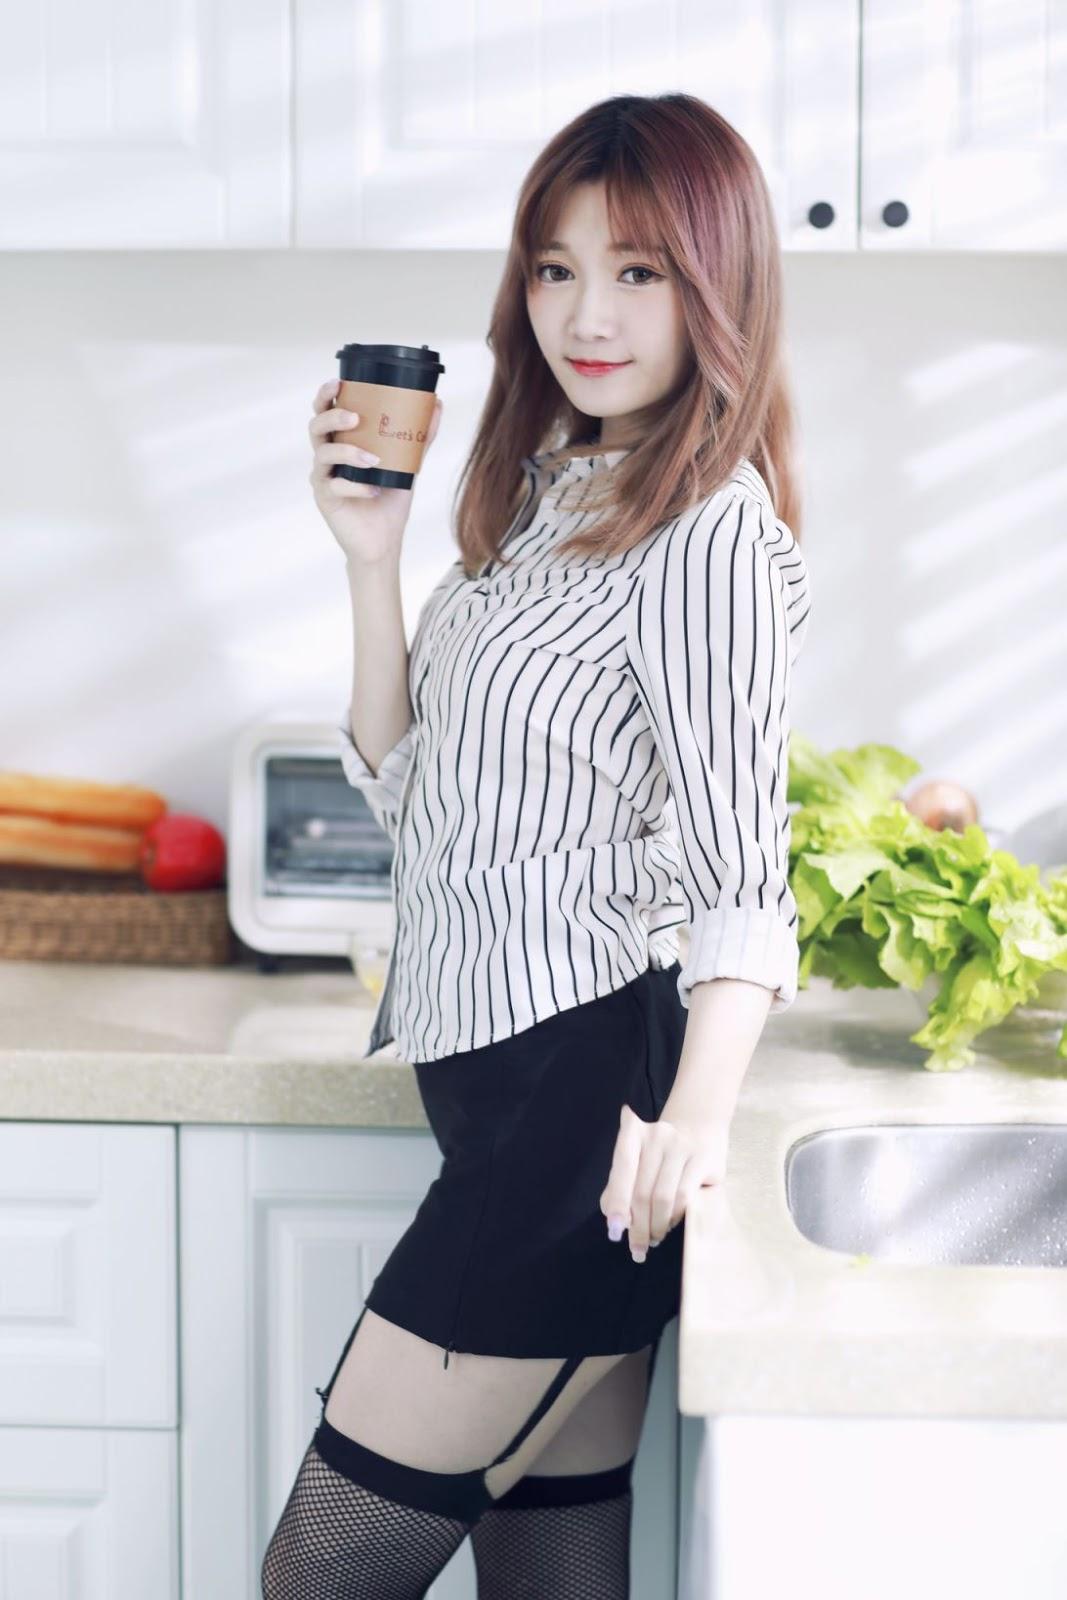 Tian Tian - 甜天 - 2019.10.20 - Kitchen Daily - TruePic.net